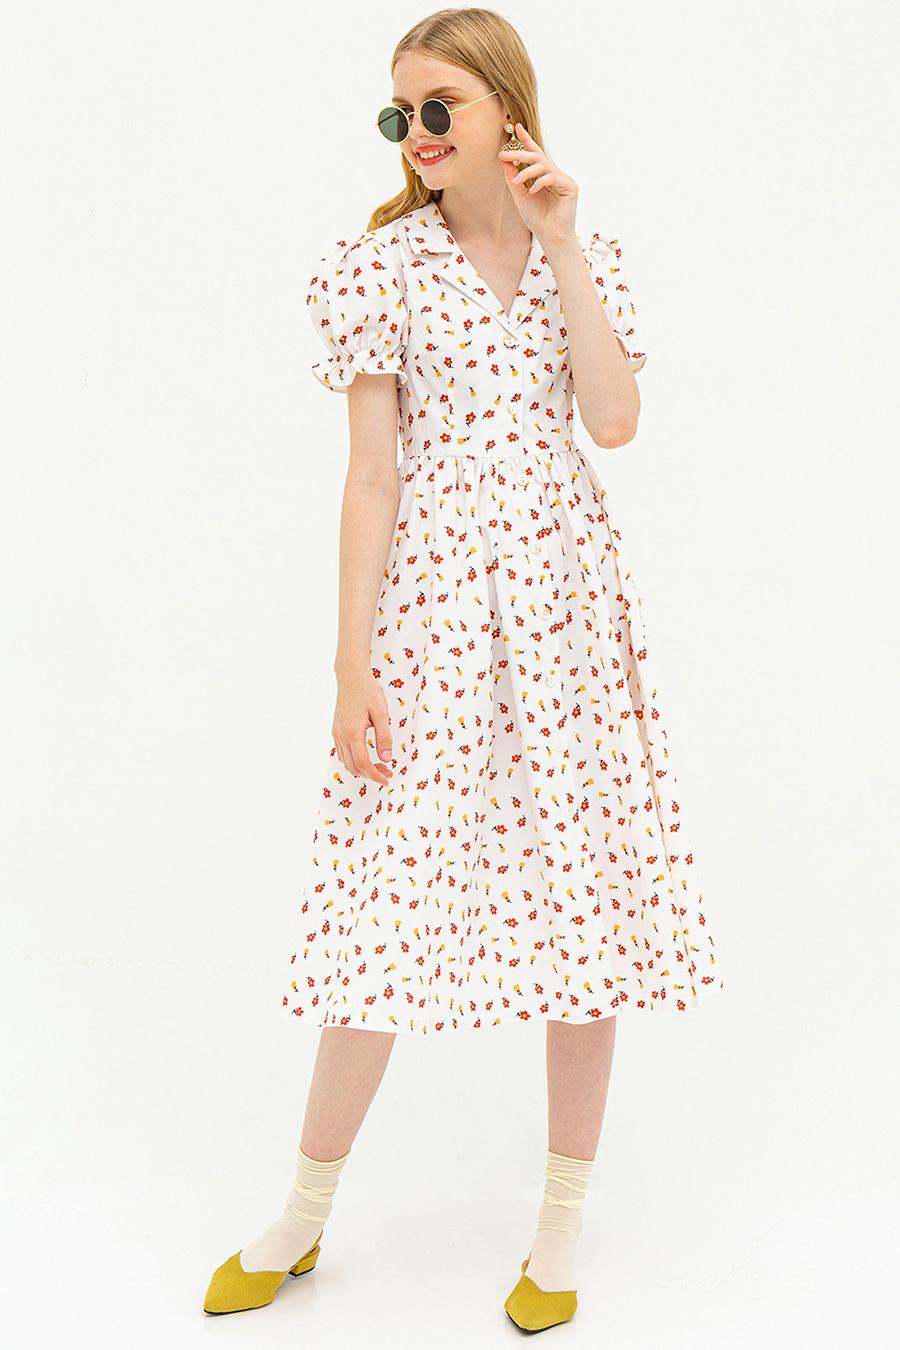 *RESTOCKED* MAGDALENE DRESS - POPPY [BY MODPARADE]